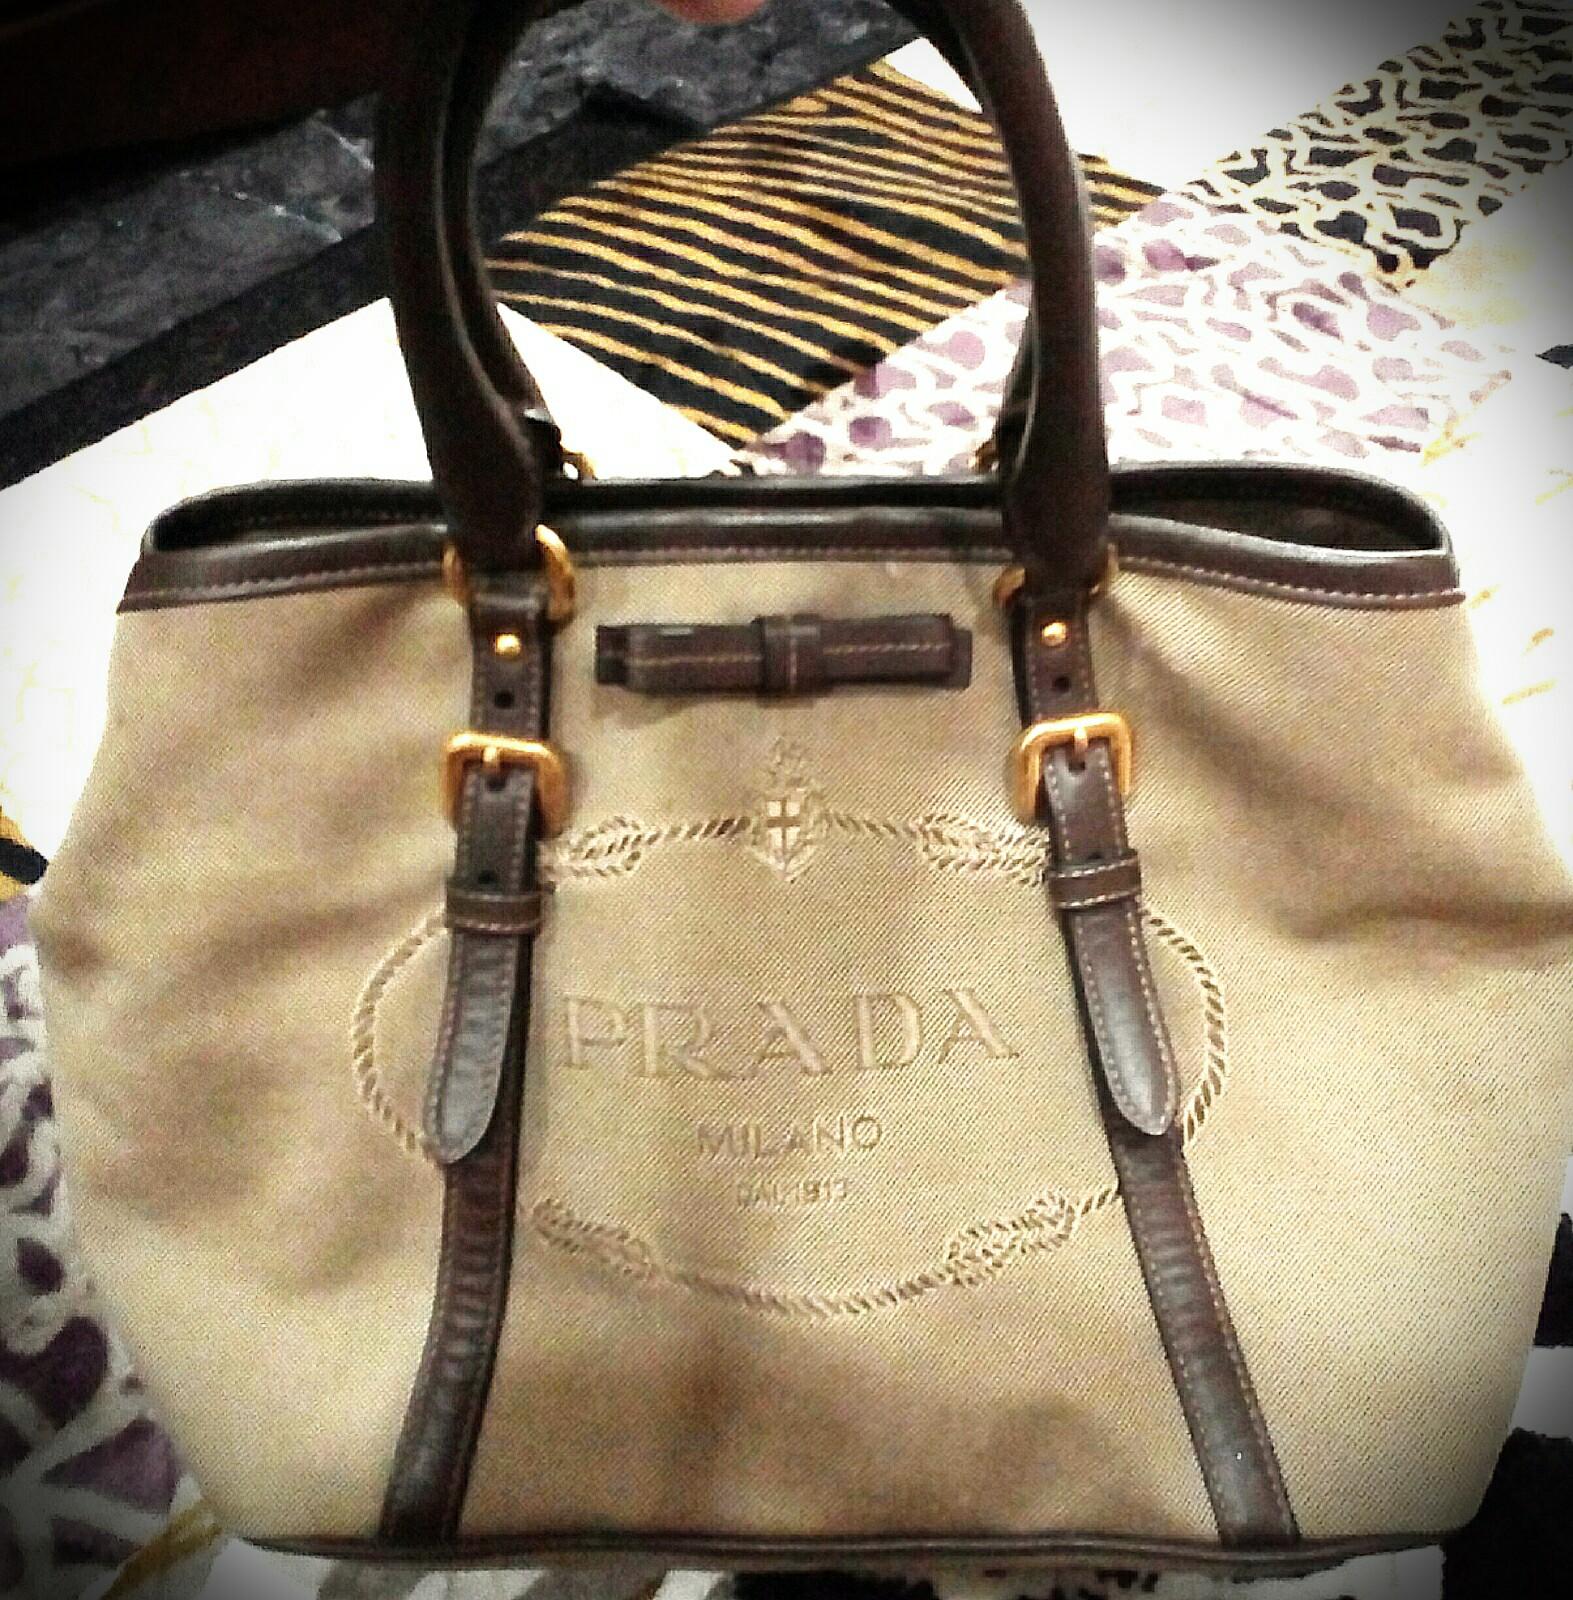 7f87b9666f ... coupon for original prada milano dal 1913 handbag for crazy limited  offer womens fashion bags wallets